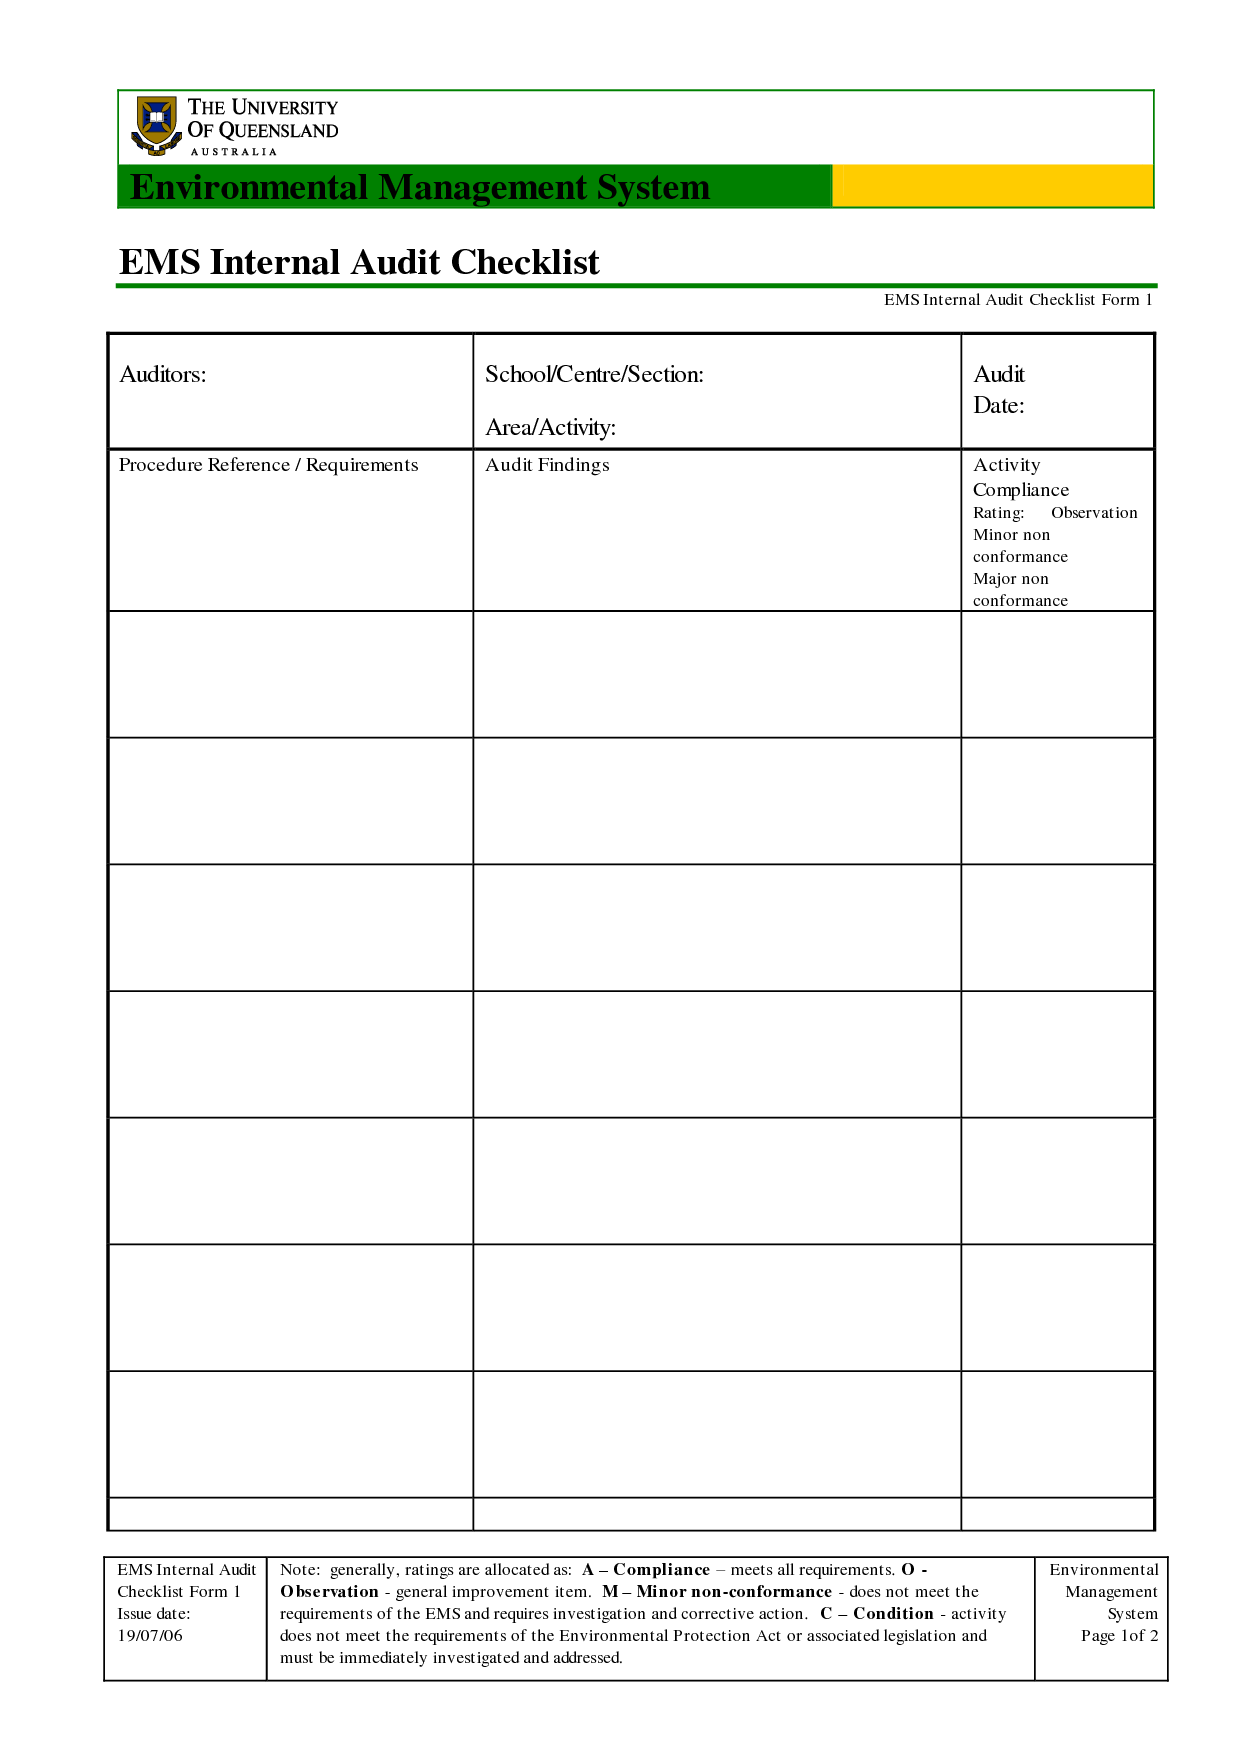 Sample Internal Audit Checklist